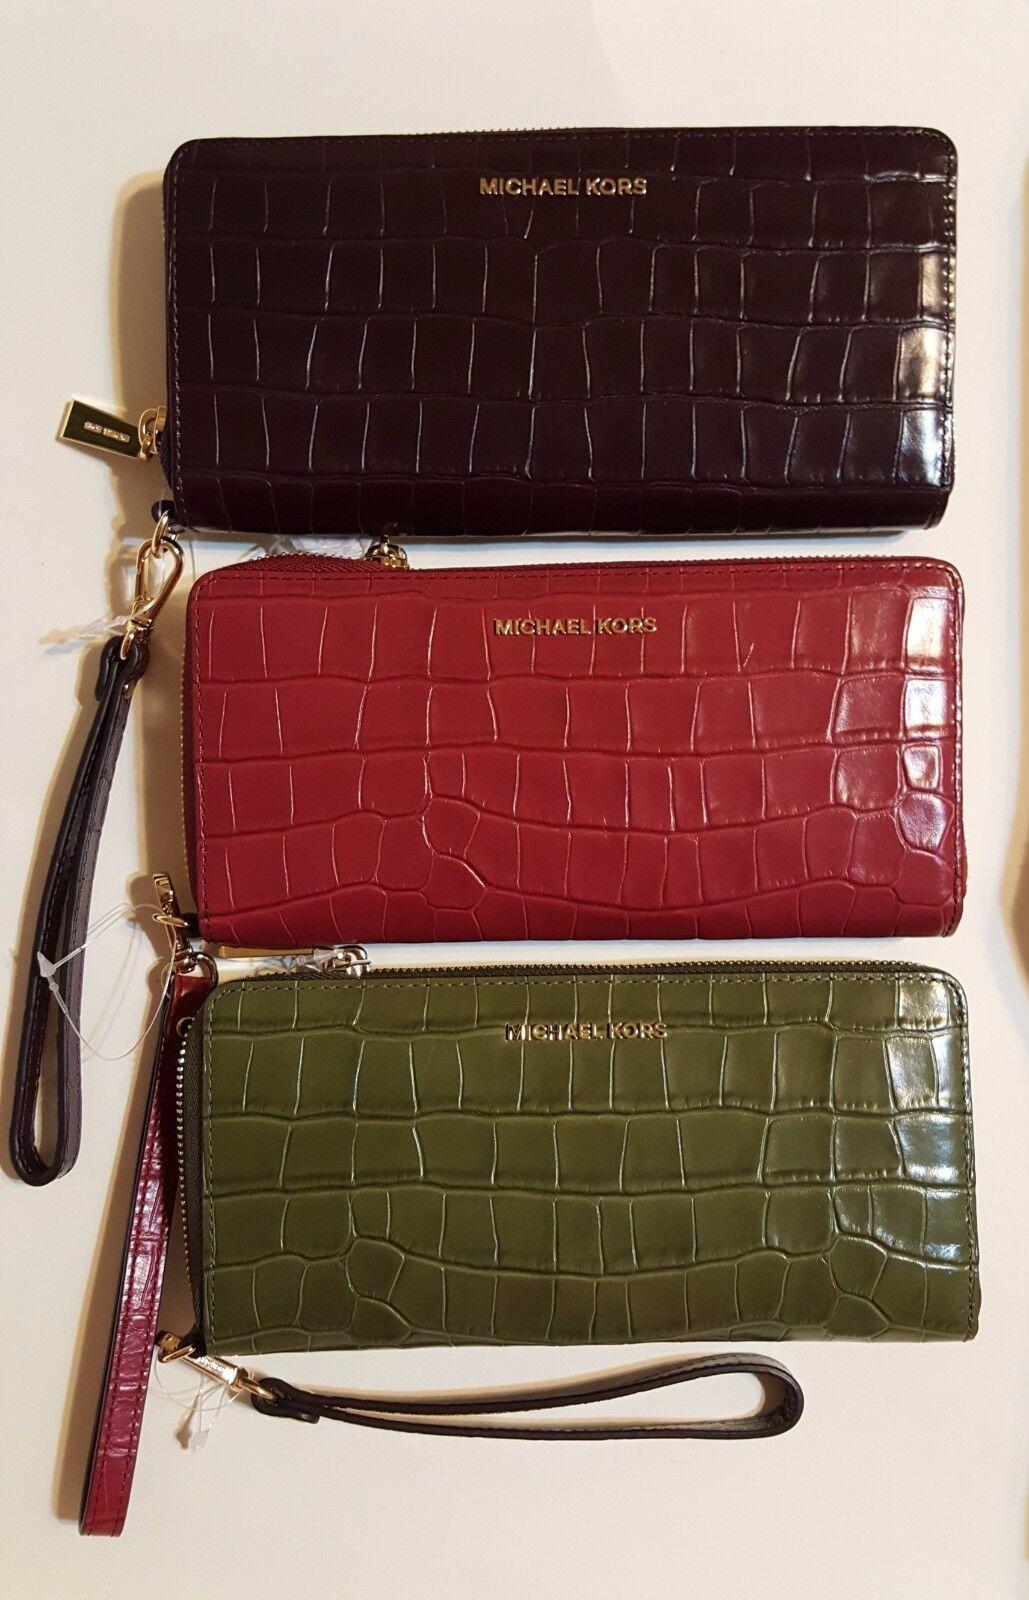 0ab37ddb0a42 Michael Kors 32f7gf6e4e Crocodile Embossed Travel CONTINENTAL Wallet Damson  for sale online | eBay